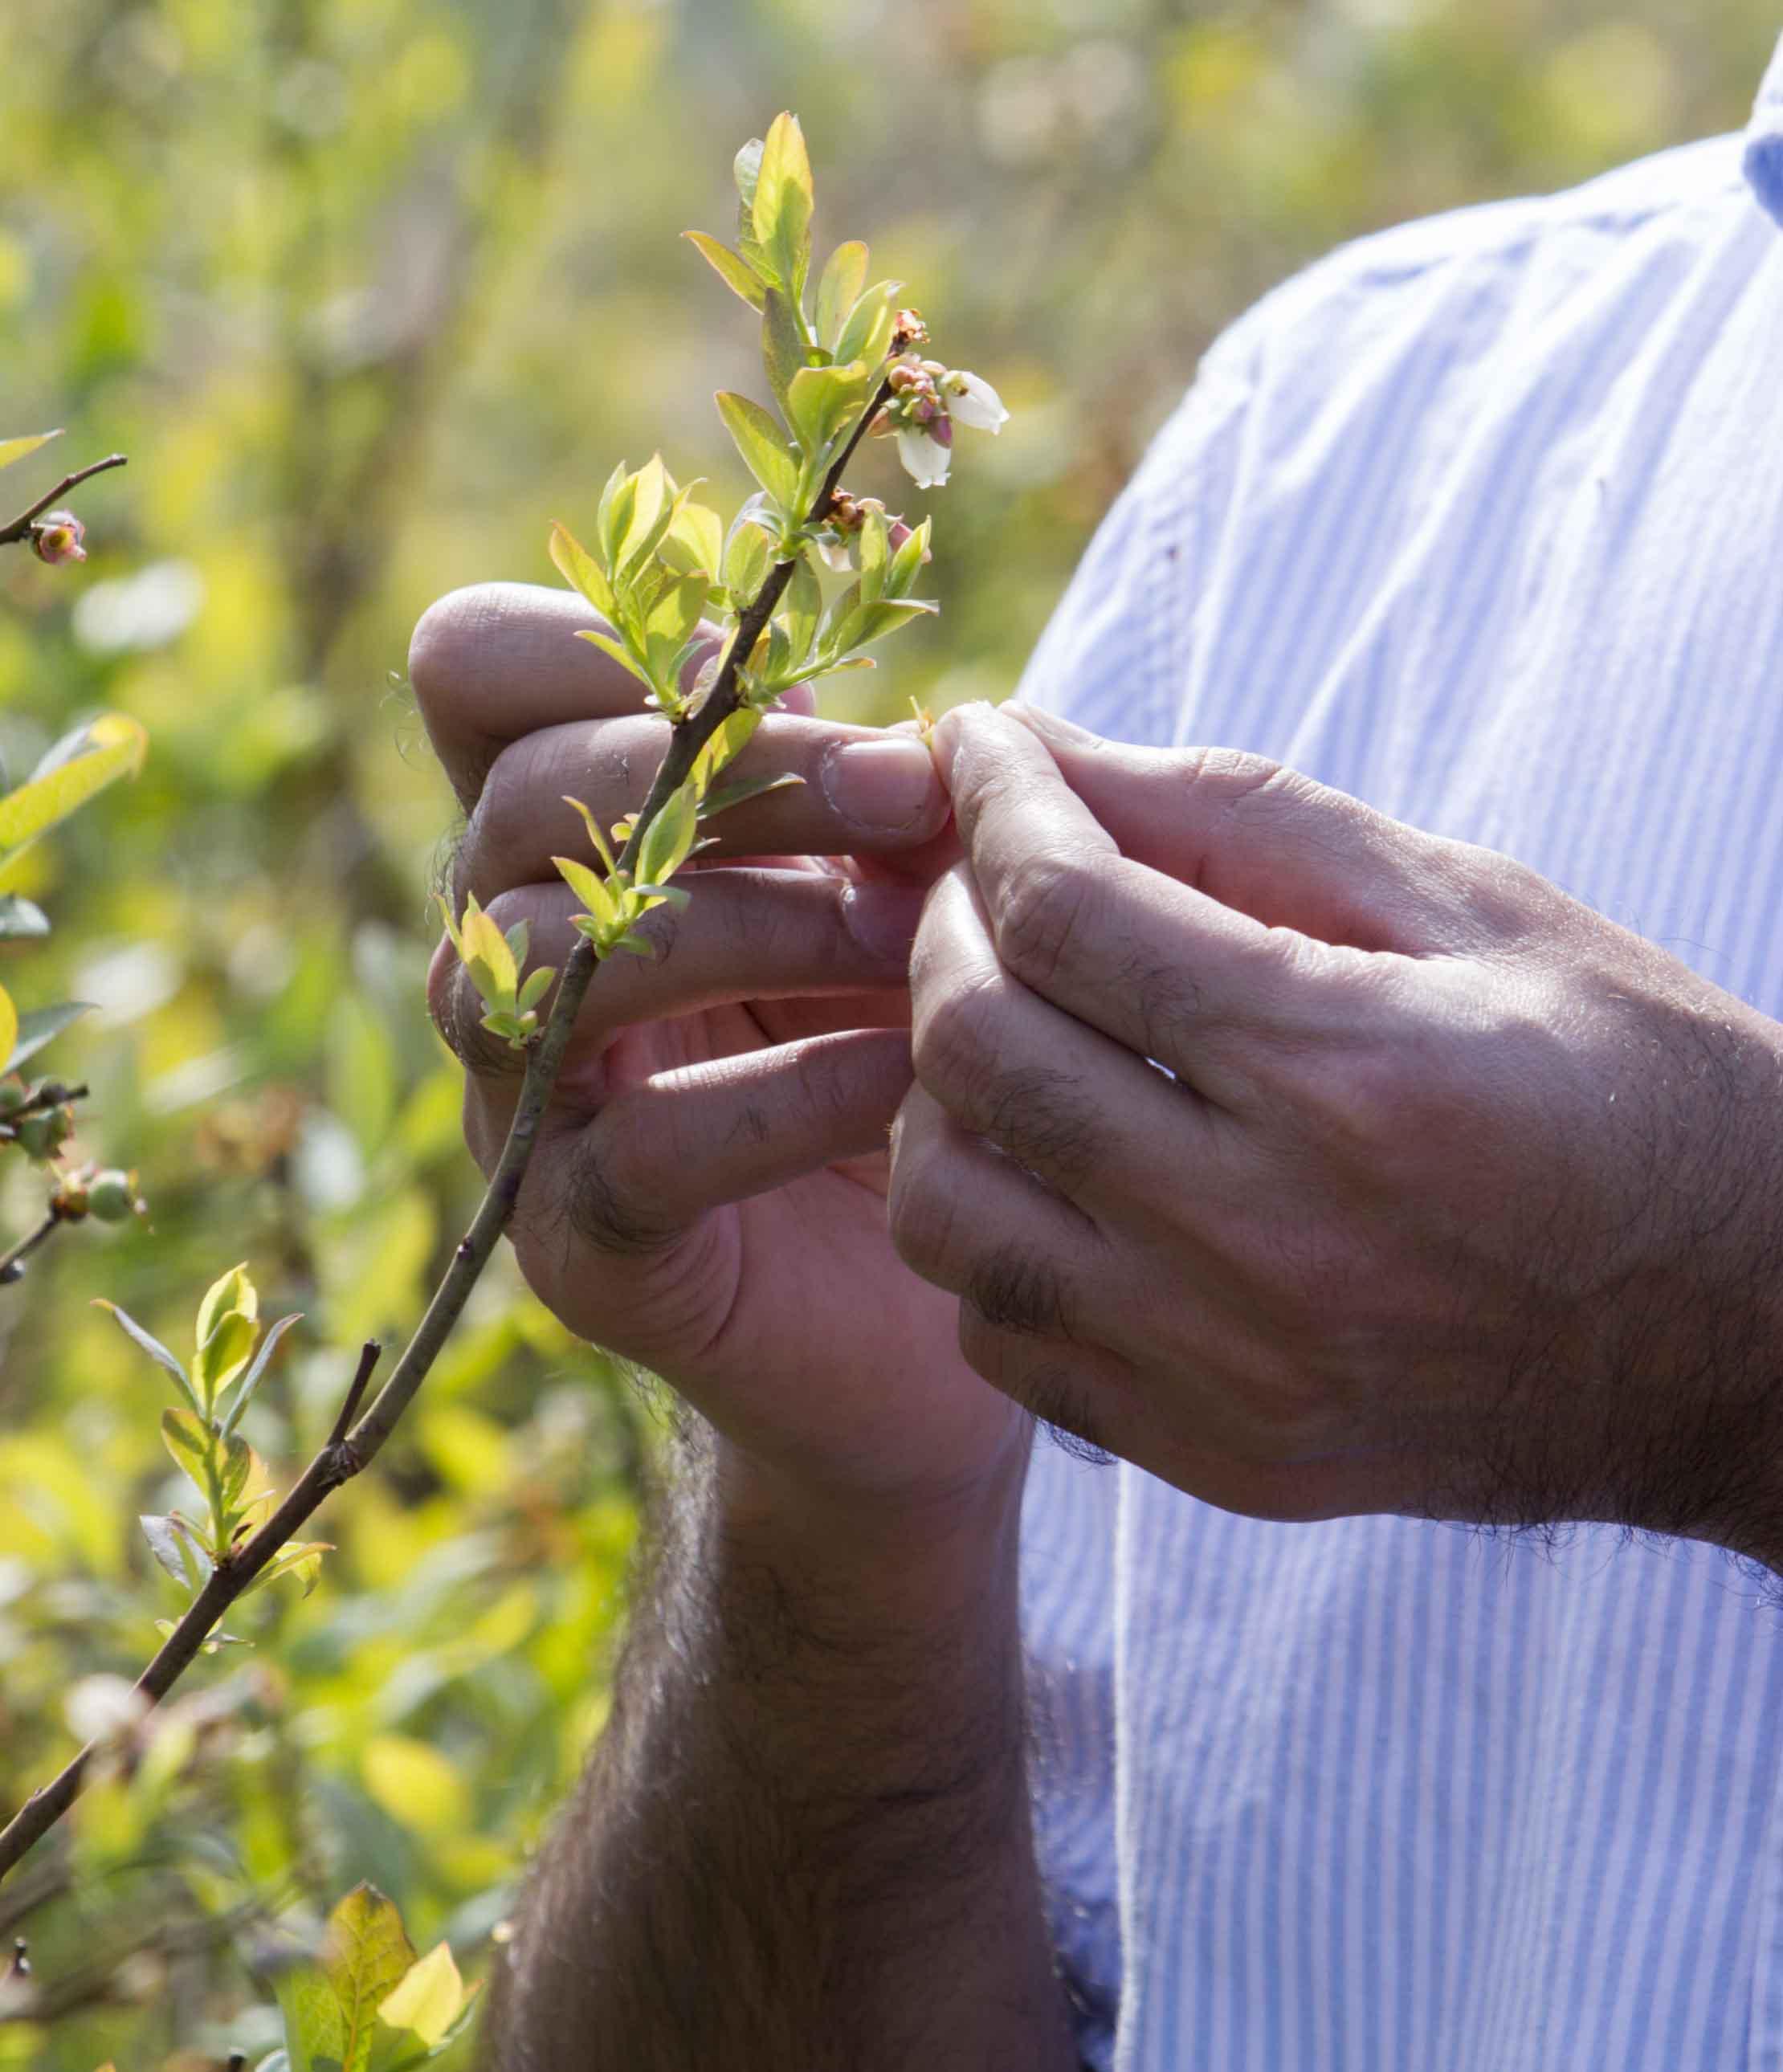 UGA entomologist Ashfaq Sial inspects a blueberry bush for damage.